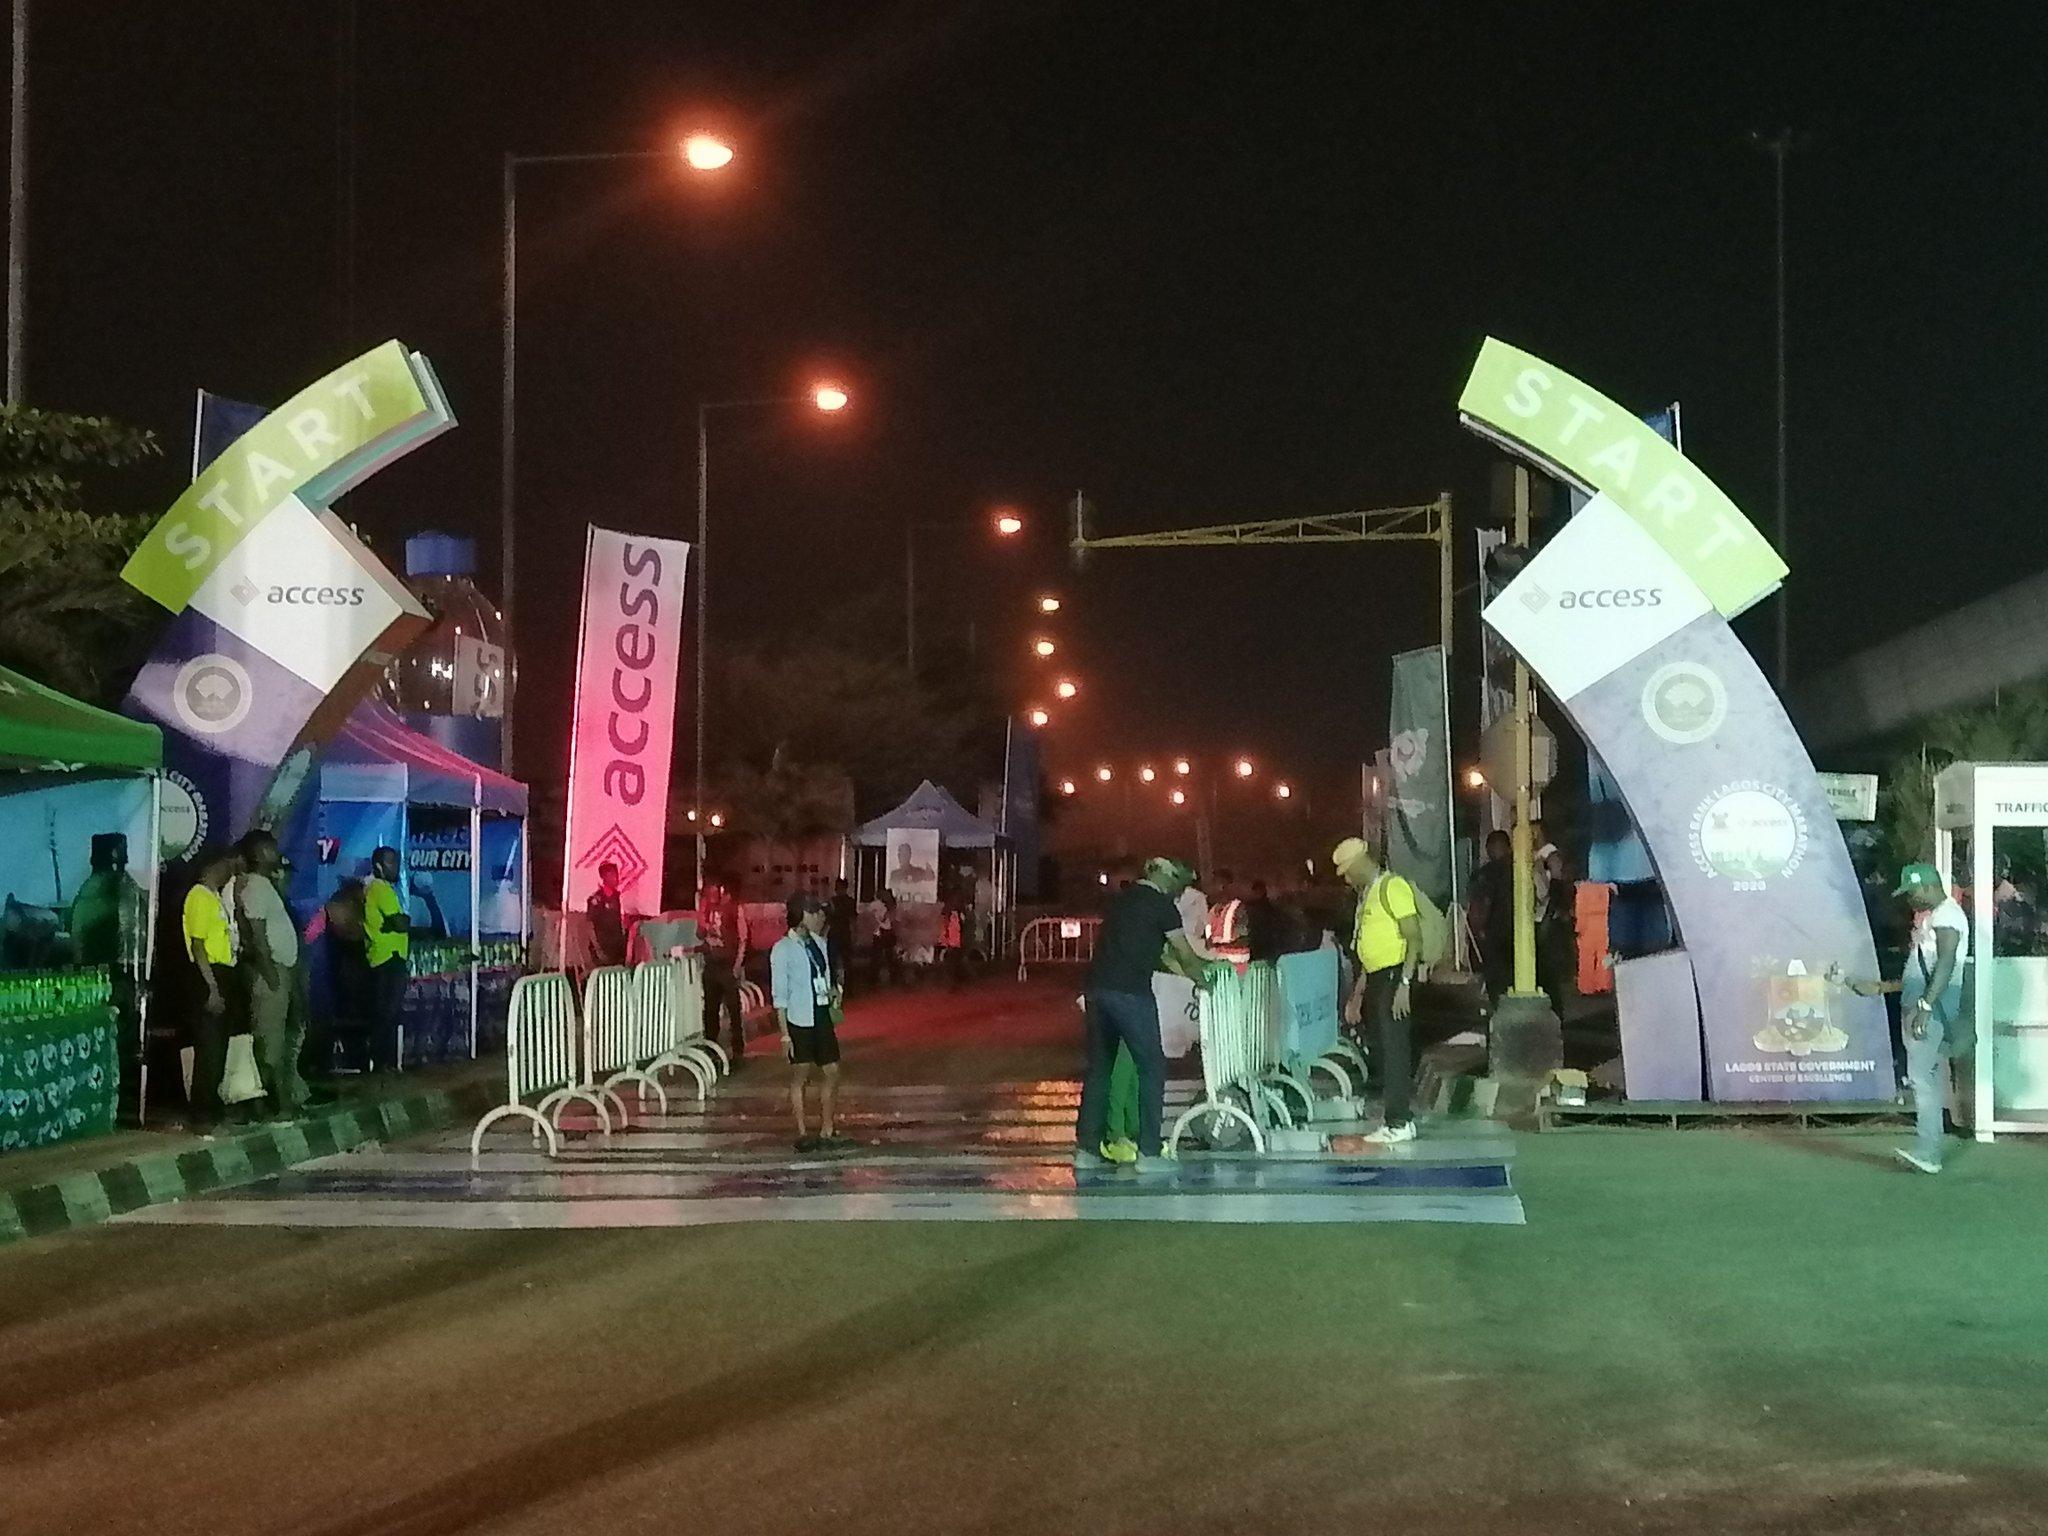 Lagos City Marathon: Athletes take off at National Stadium, Surulere